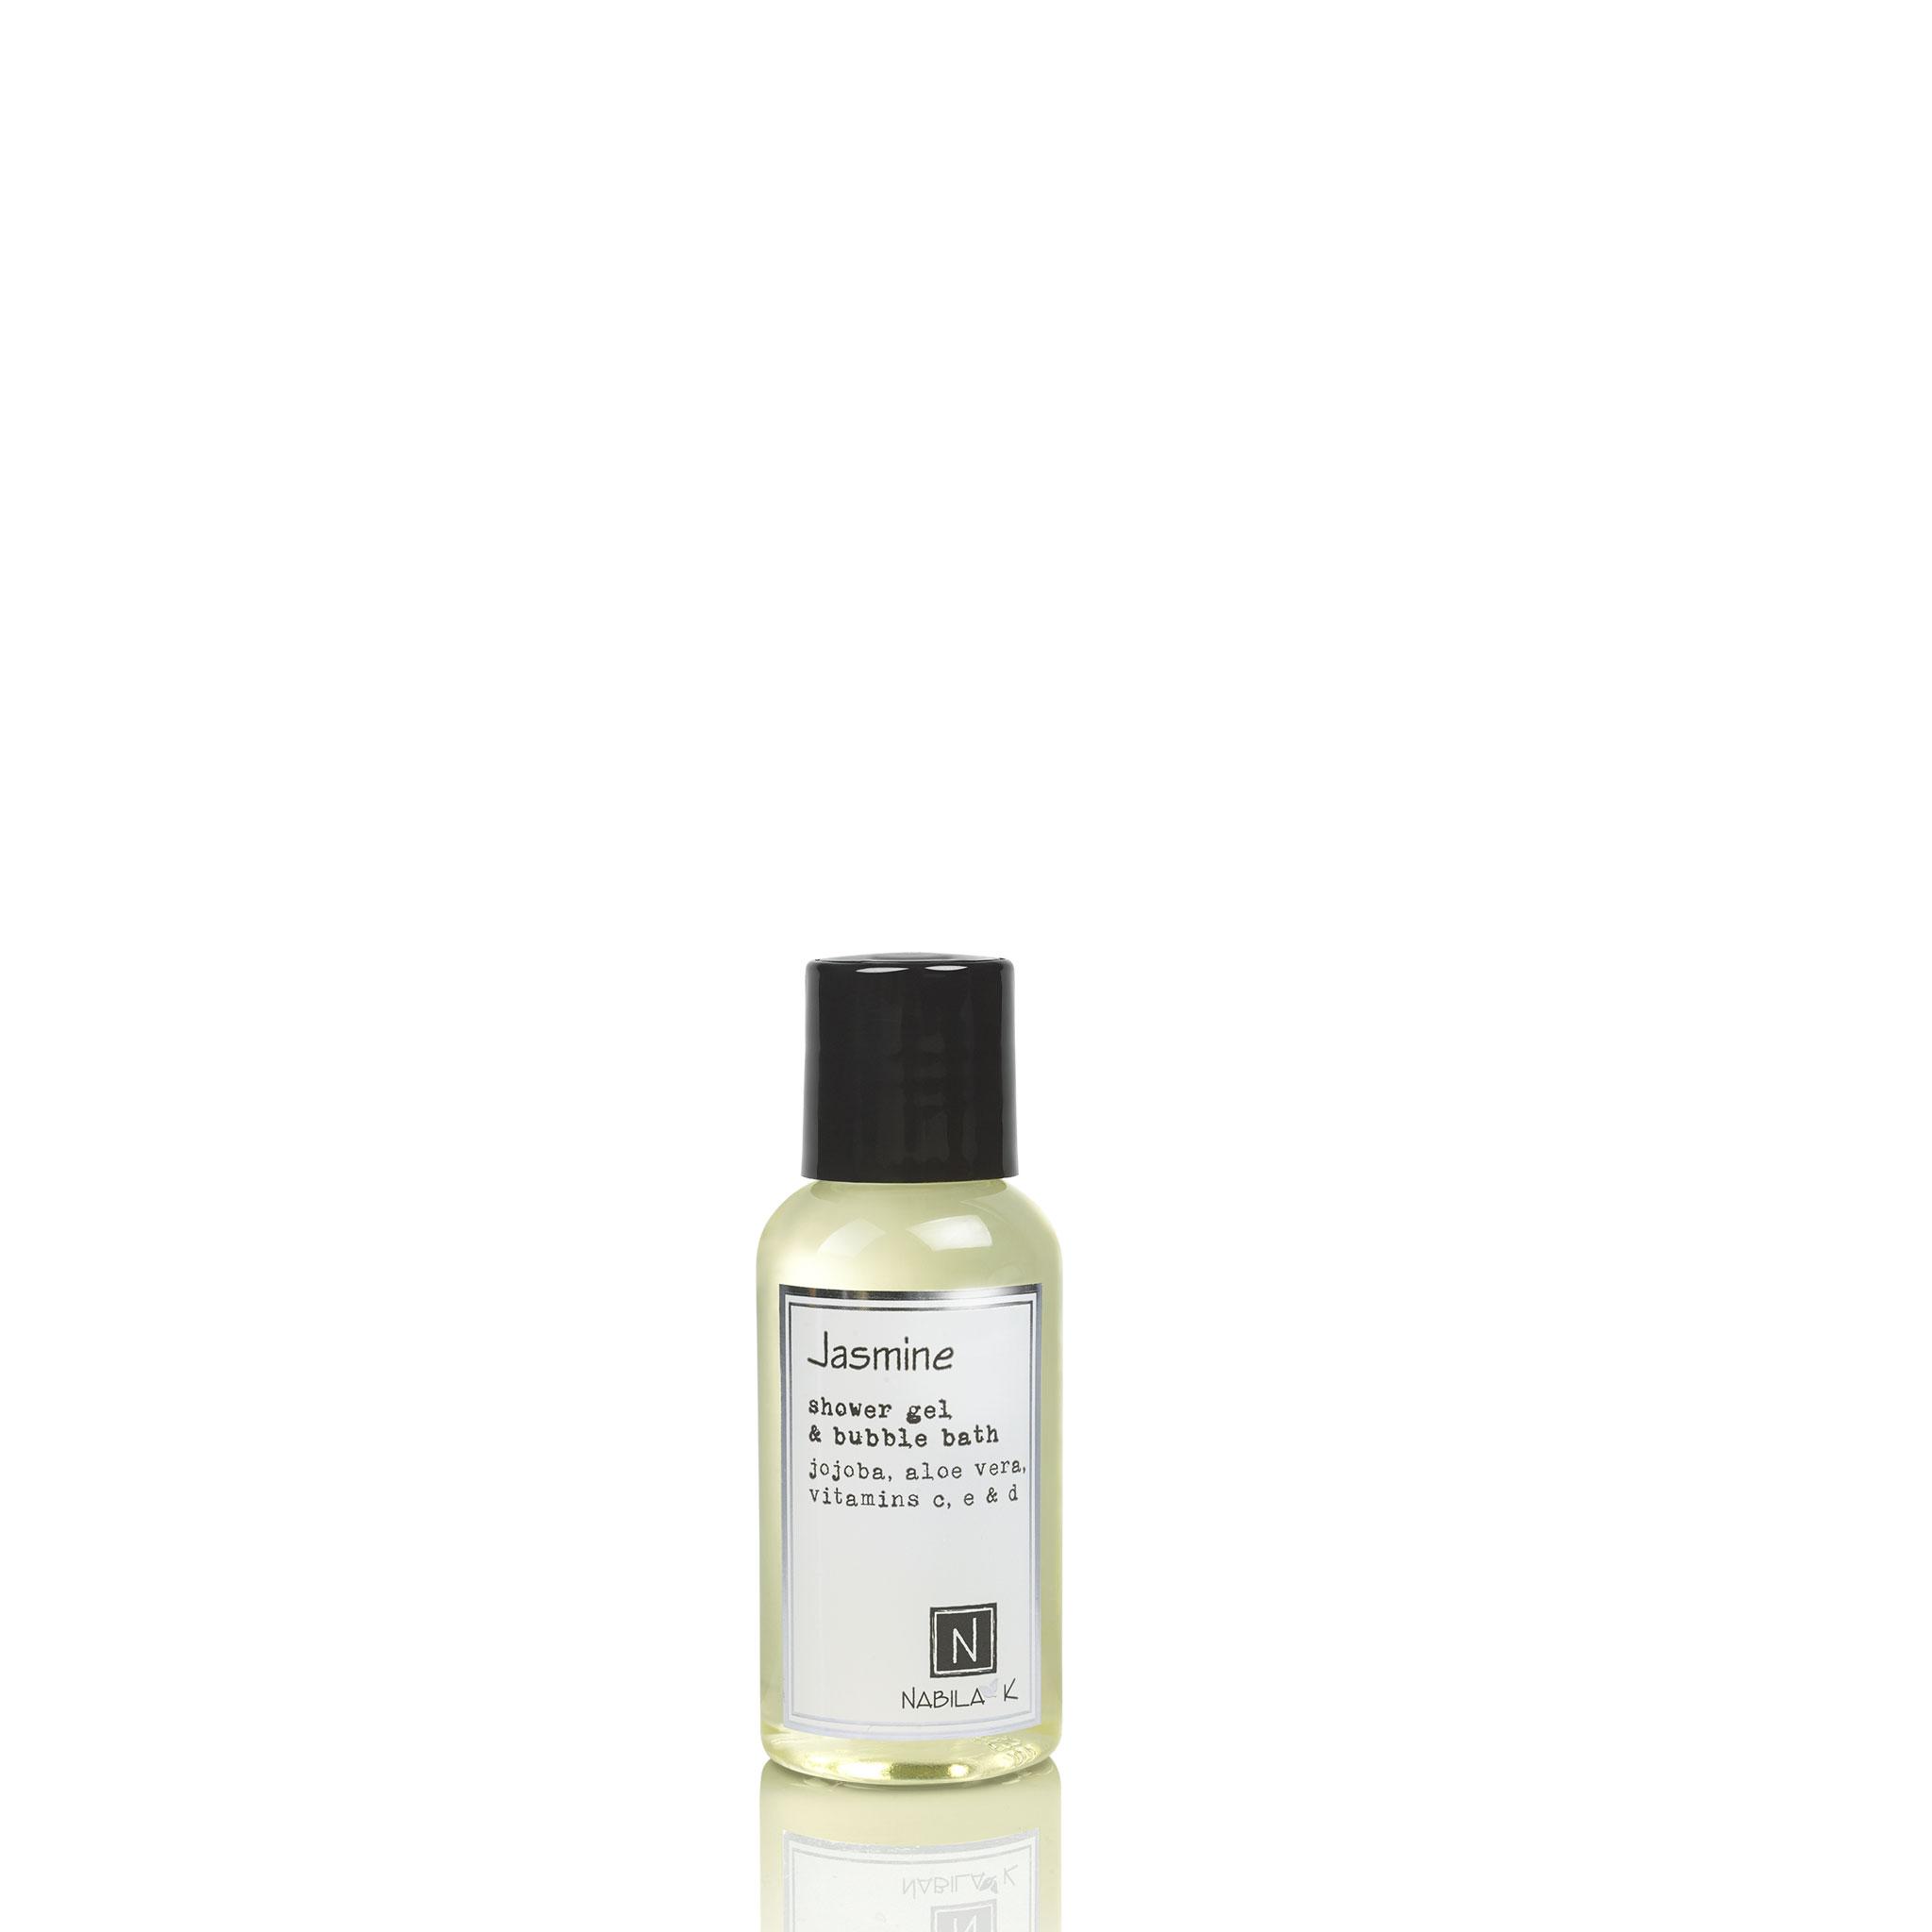 One Travel Size Version of Nabila K's Jasmine Shower Gel and Bubble Bath Jojoba, Aloe Vera, Vitamins C, E, & D